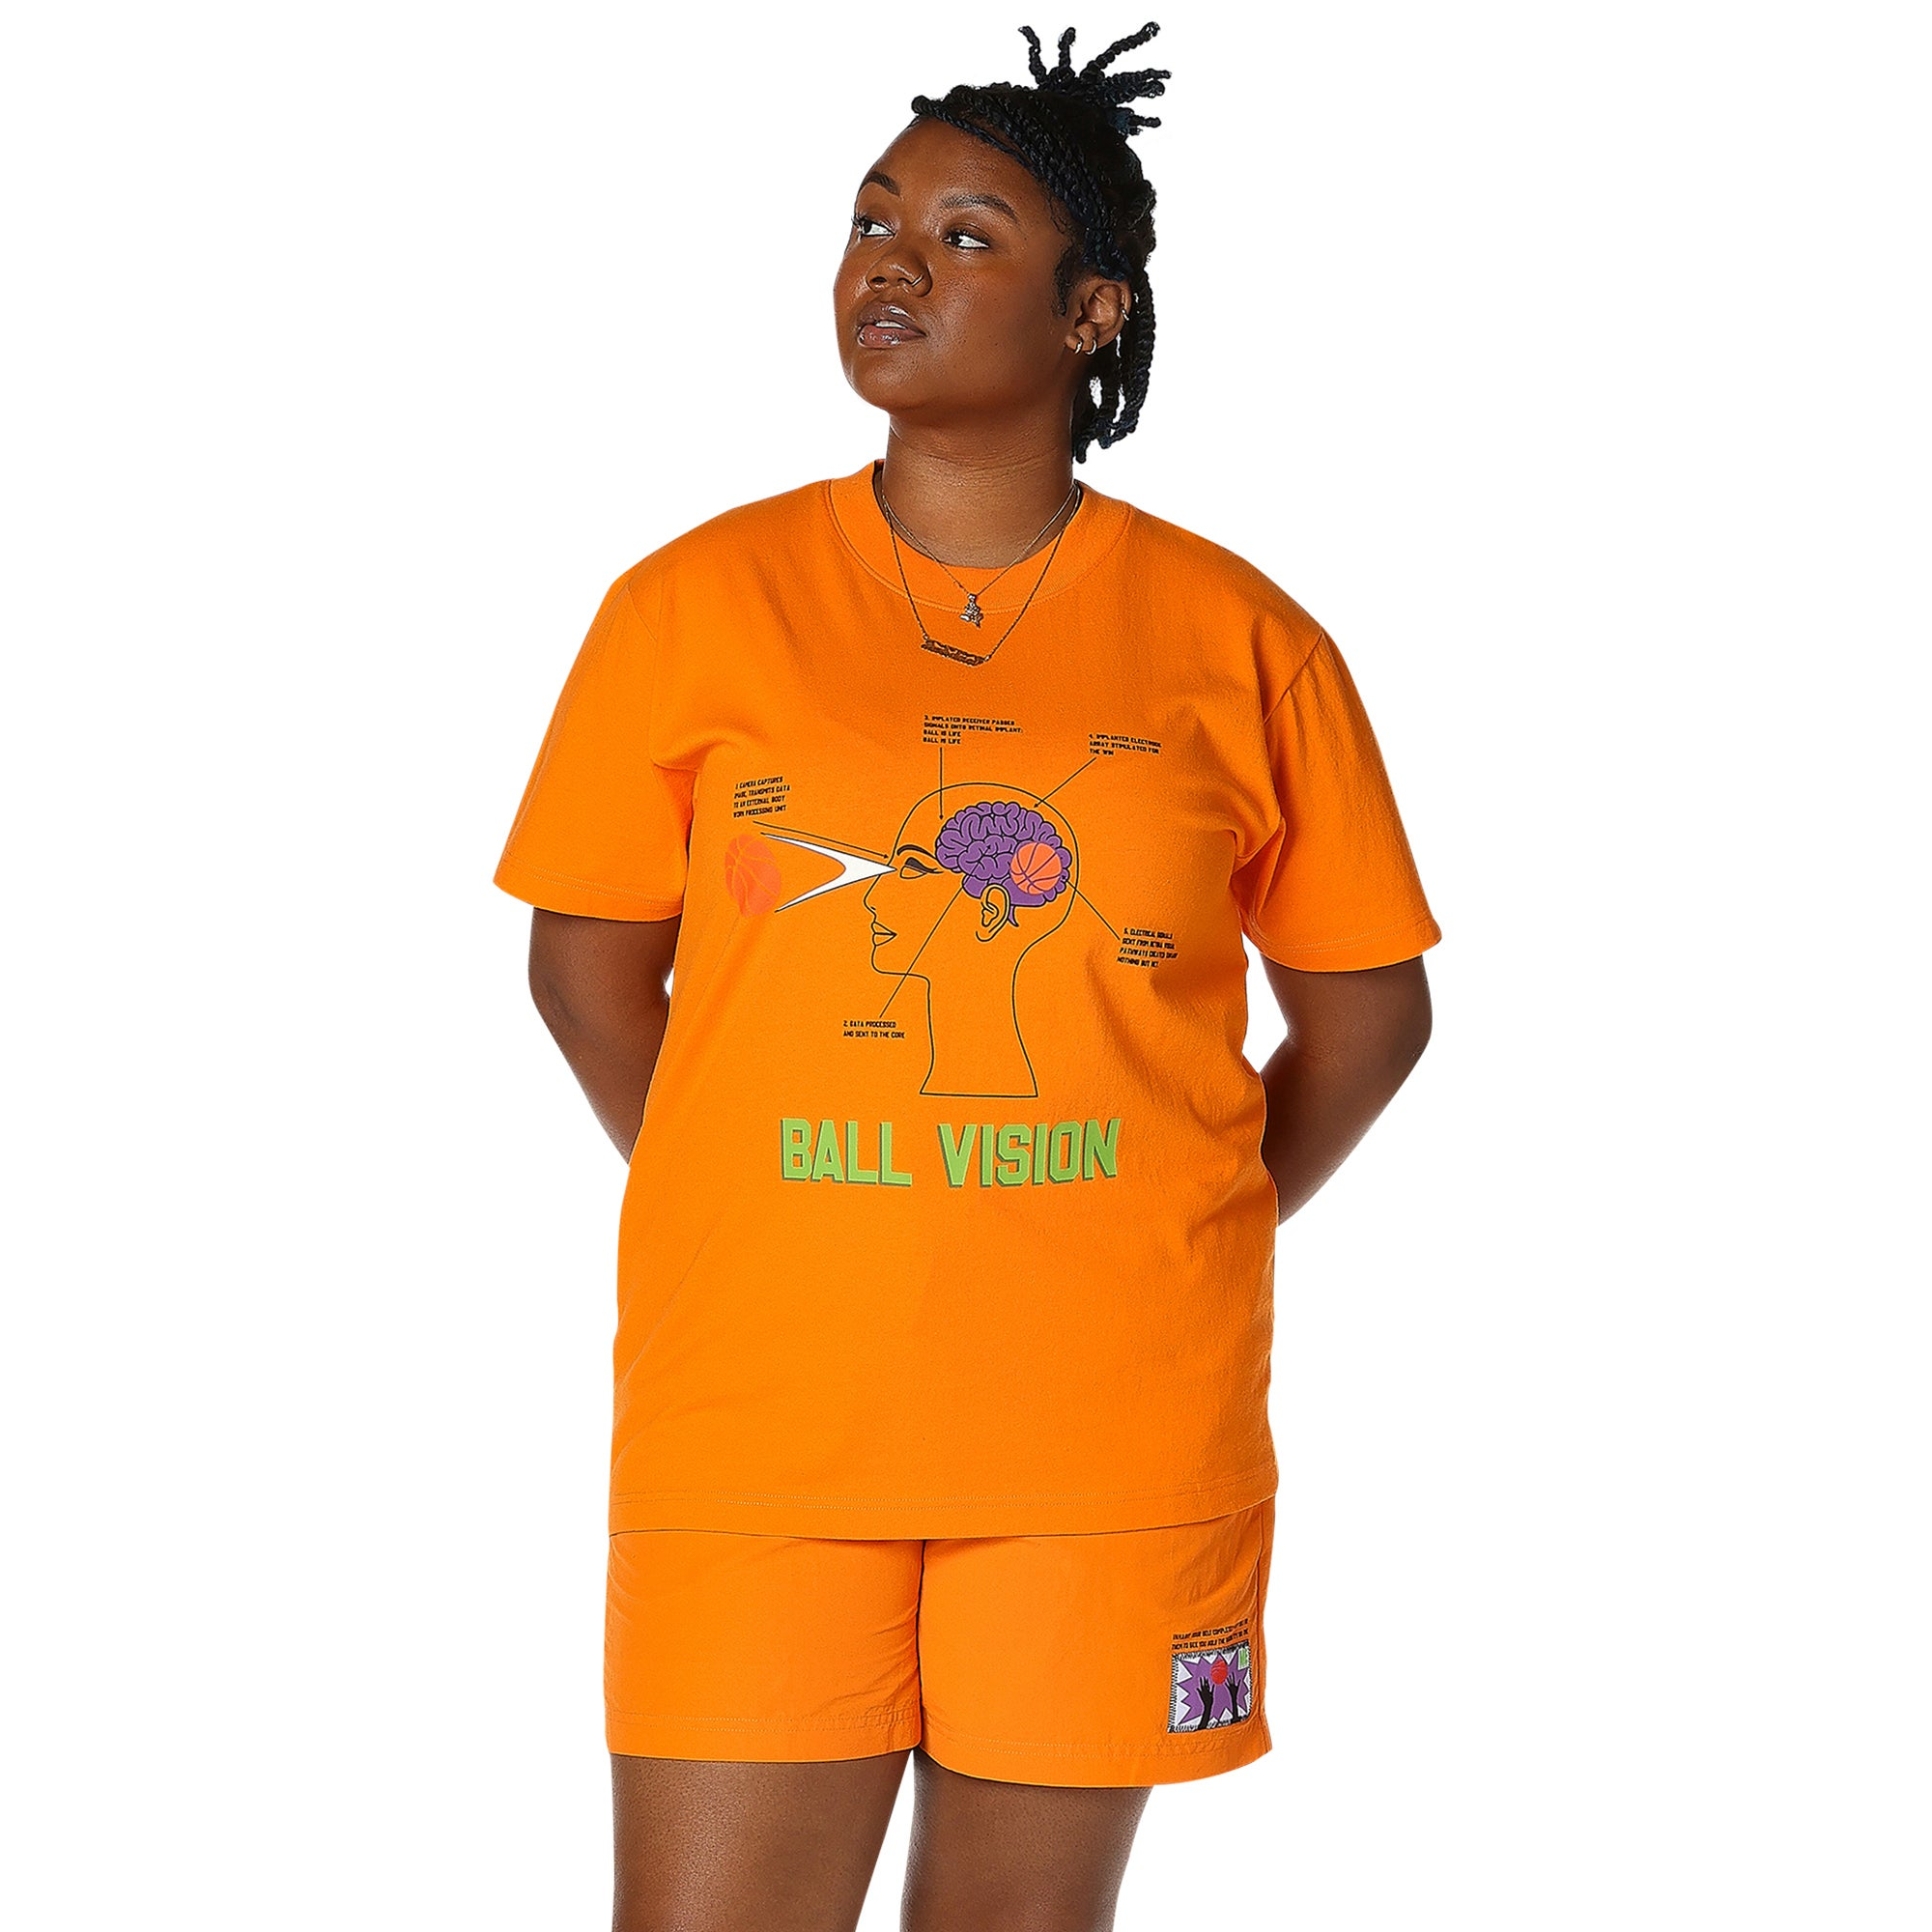 Melody Ehsani Short Sleeve T-shirt